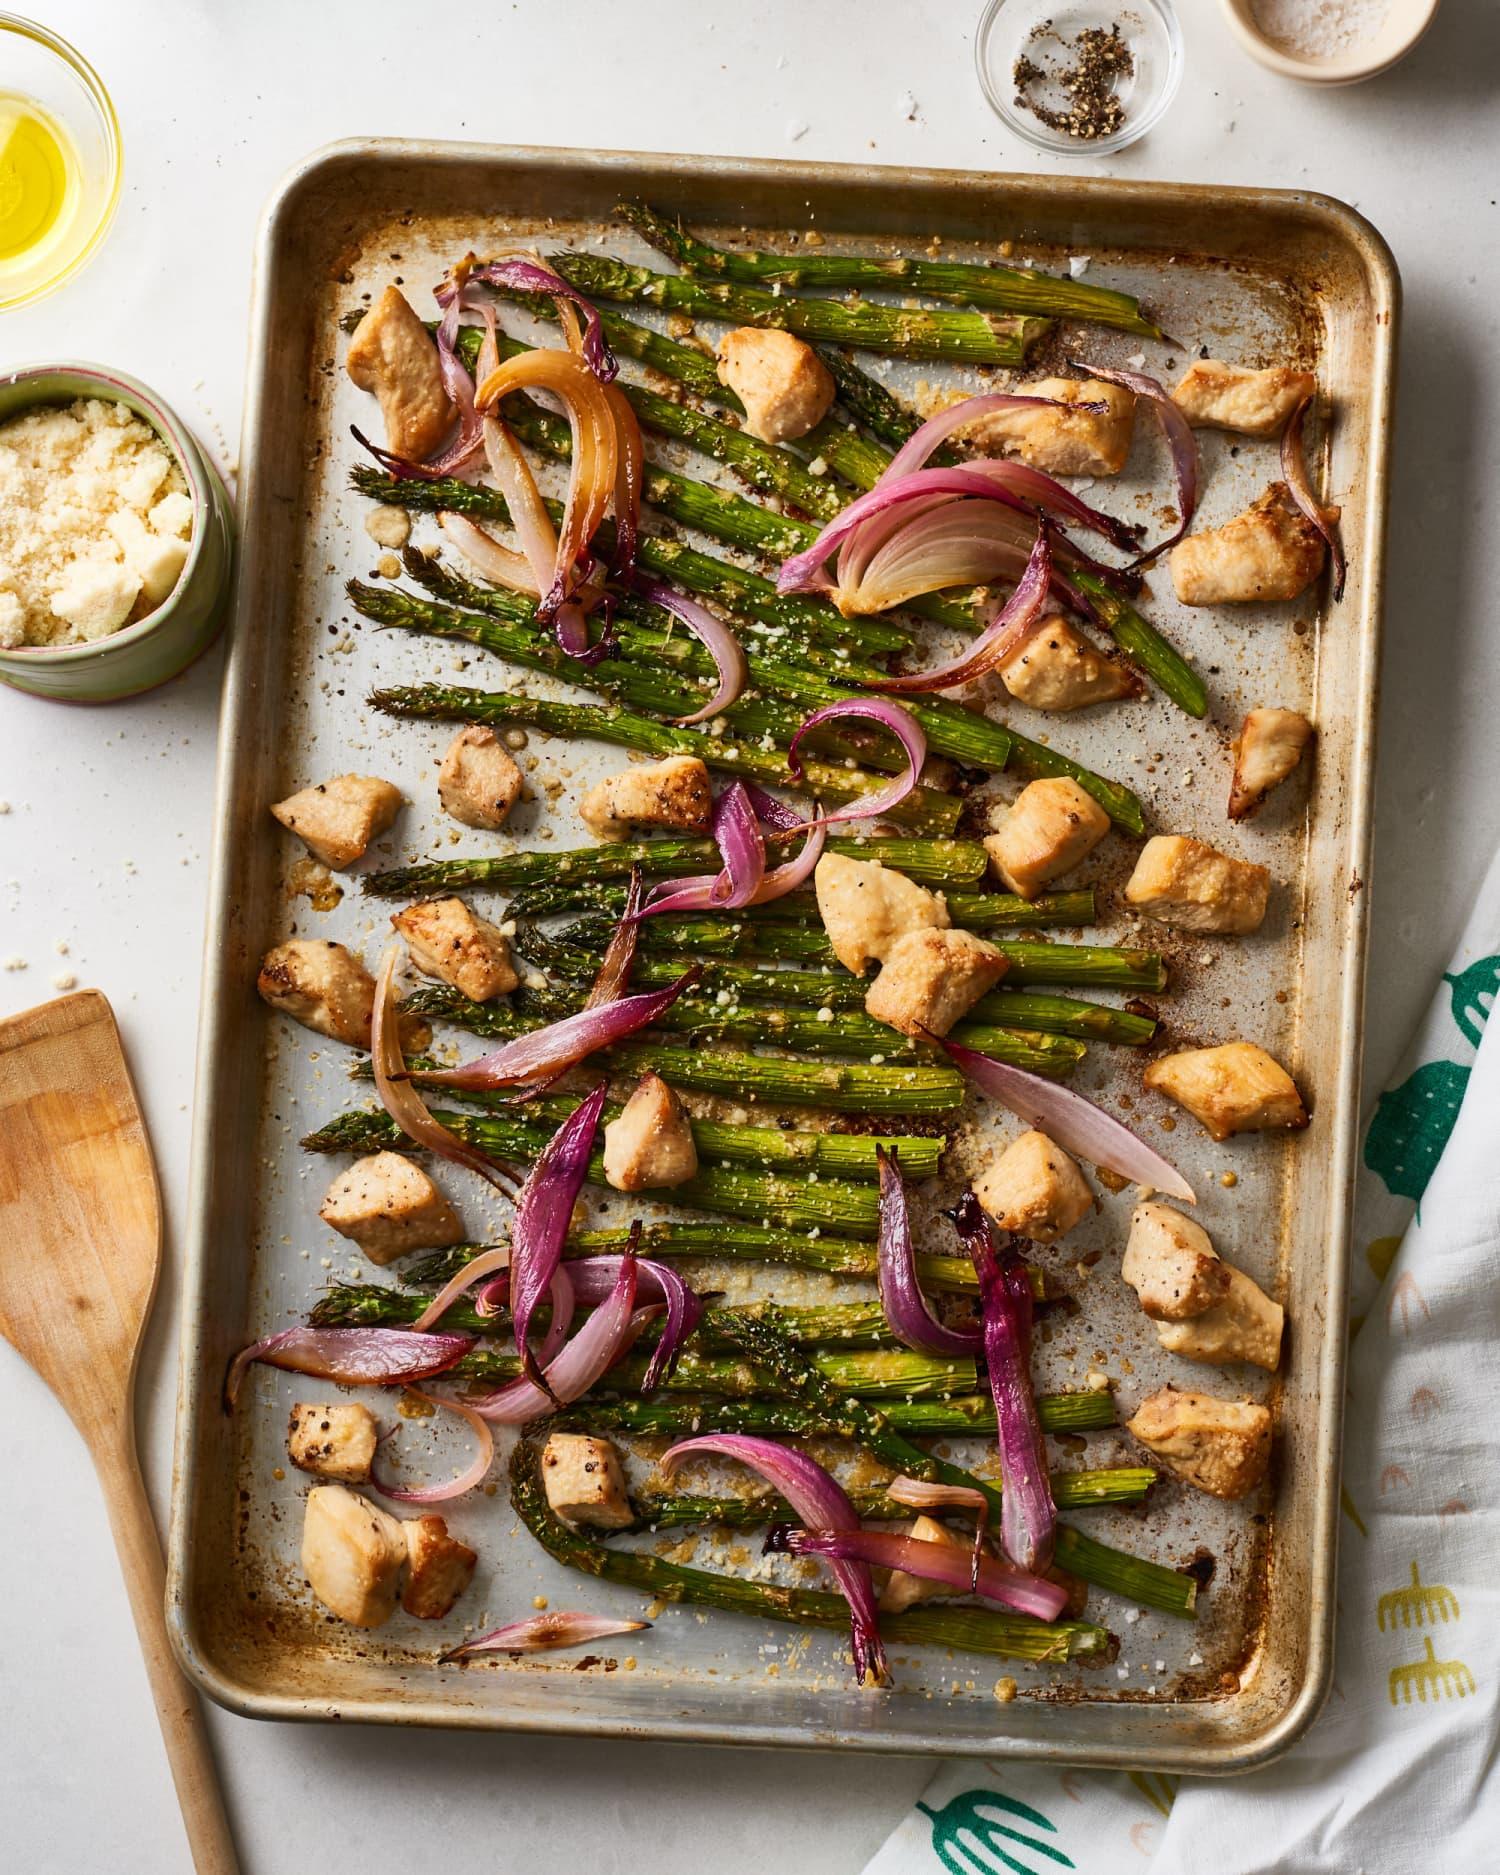 Recipe: Garlic Parmesan Chicken and Veggies